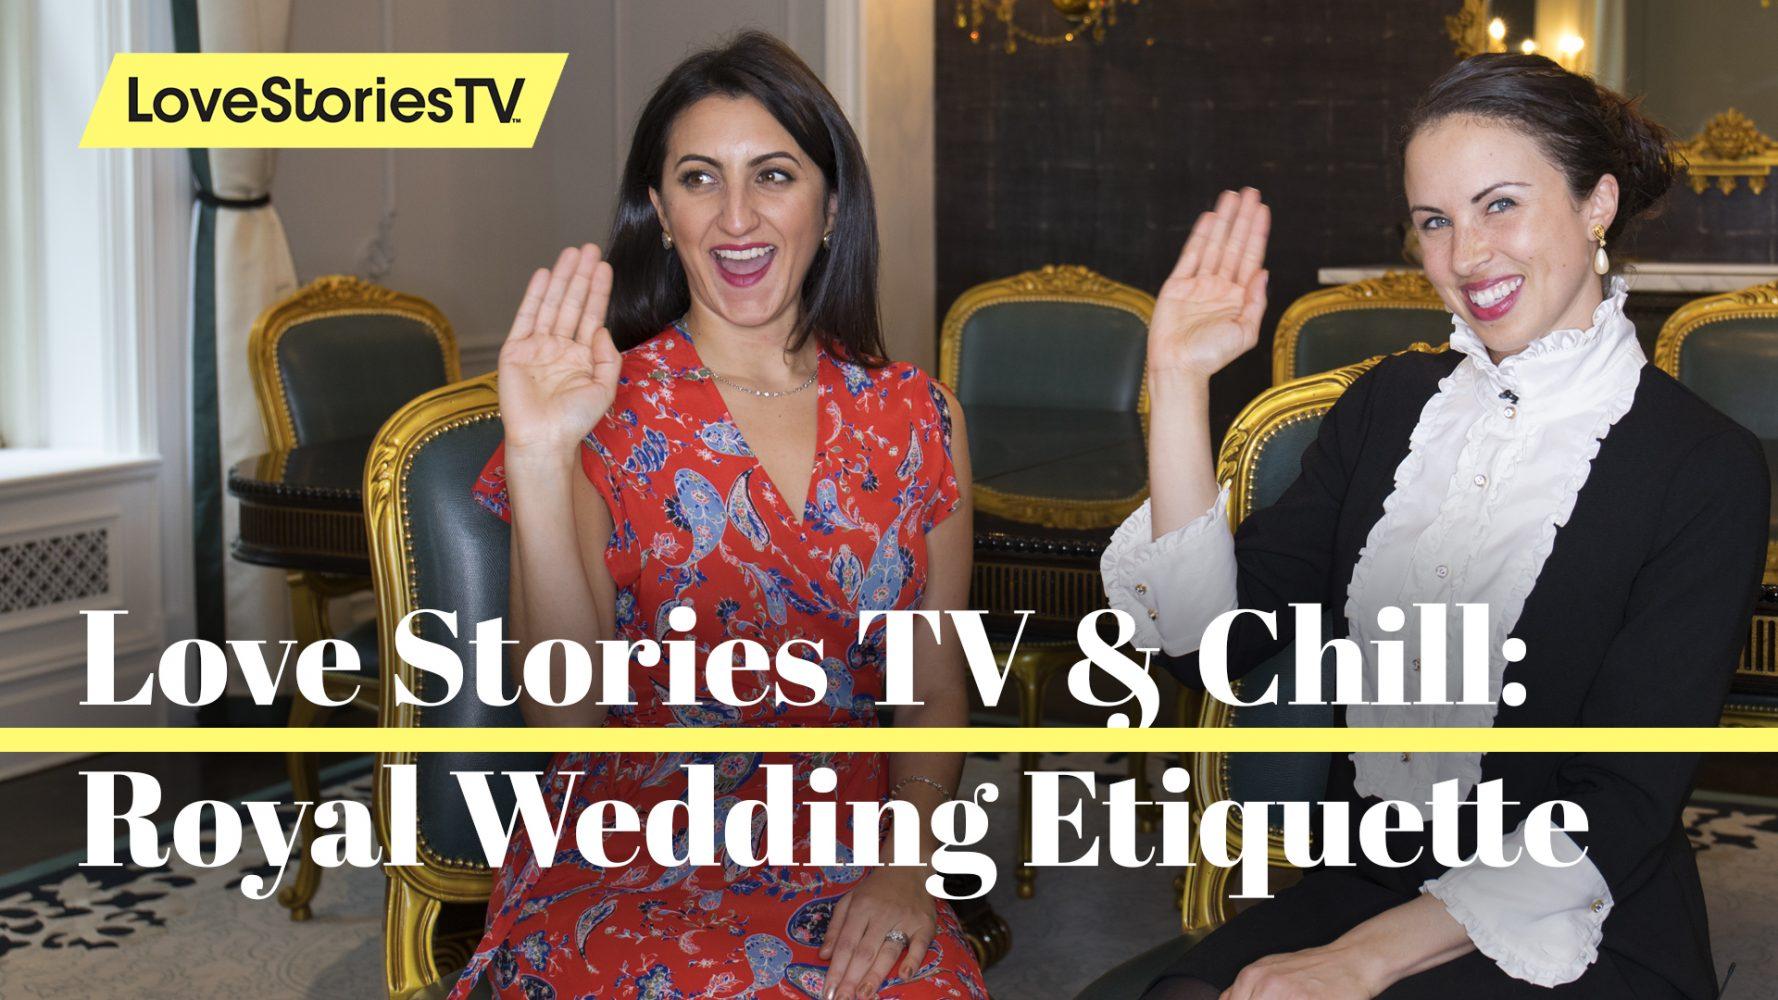 #LoveStoriesTVandChill Episode 20: Royal Wedding Etiquette With Myka Meier